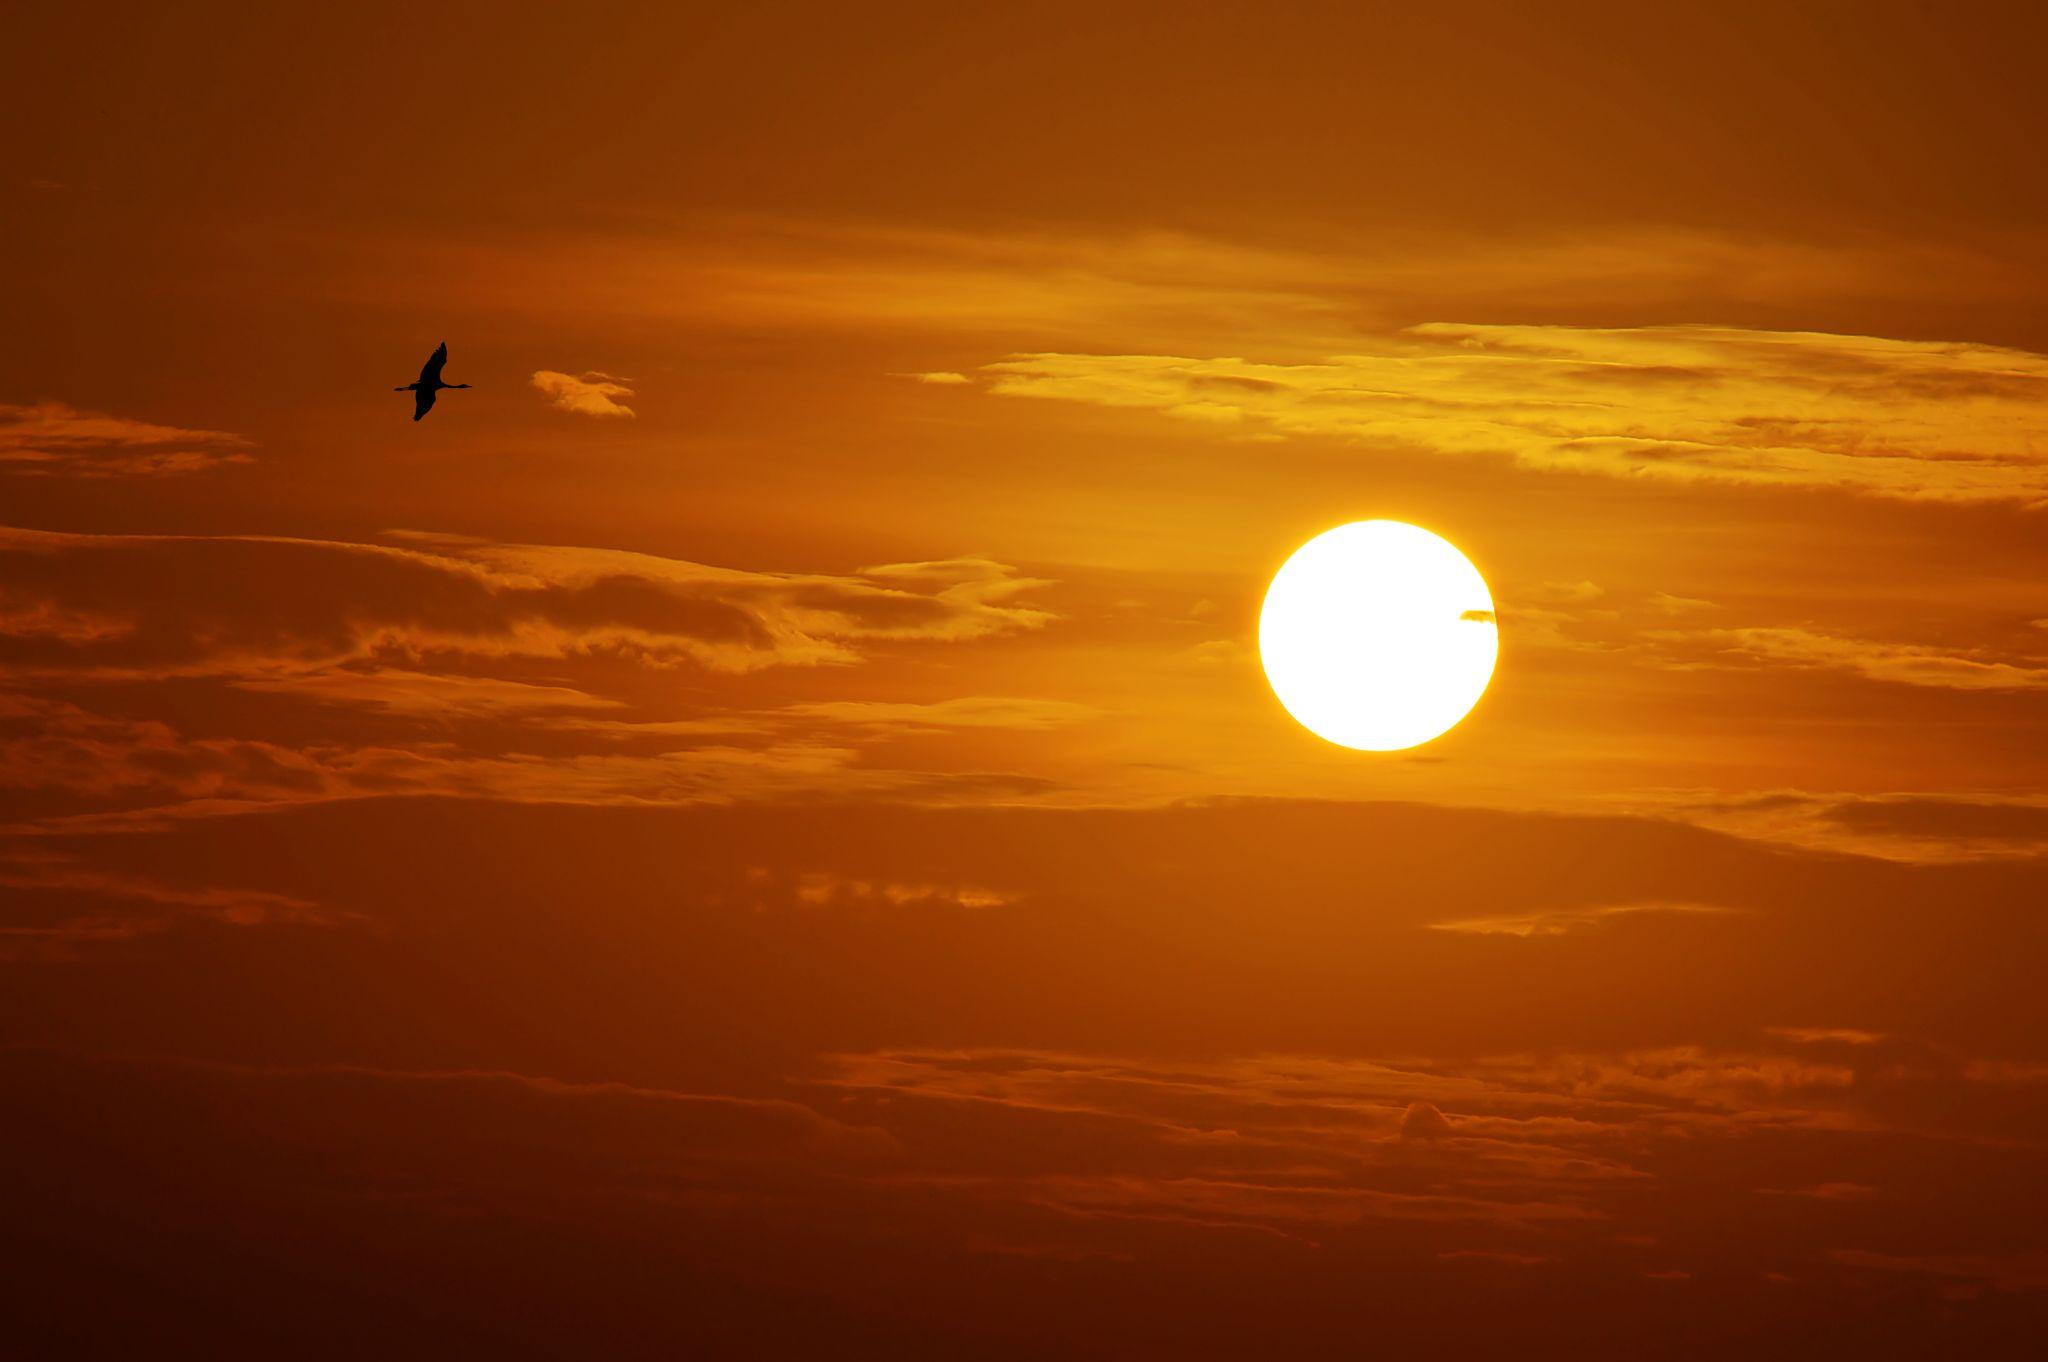 Sunset by Sourav Mishra